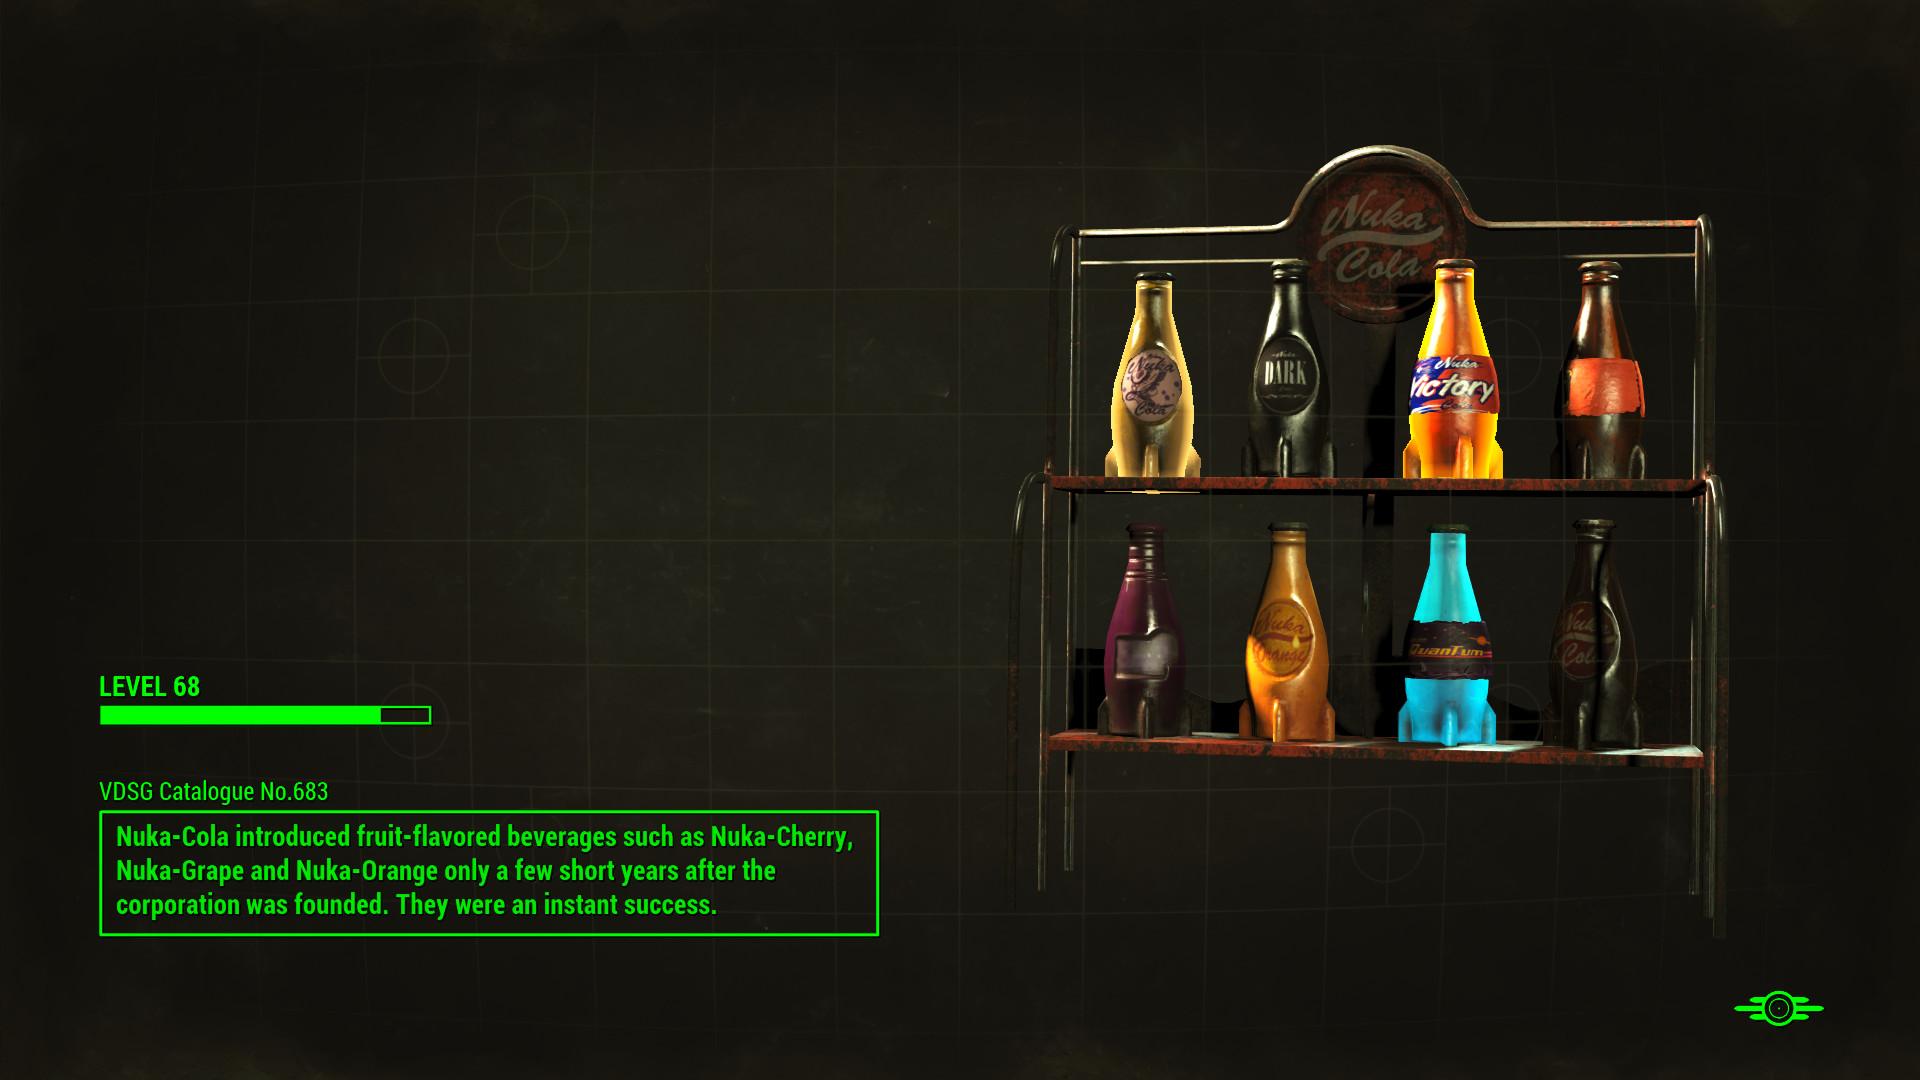 Res: 1920x1080, Nuka Cola Variants Shelf Loading Screen.png